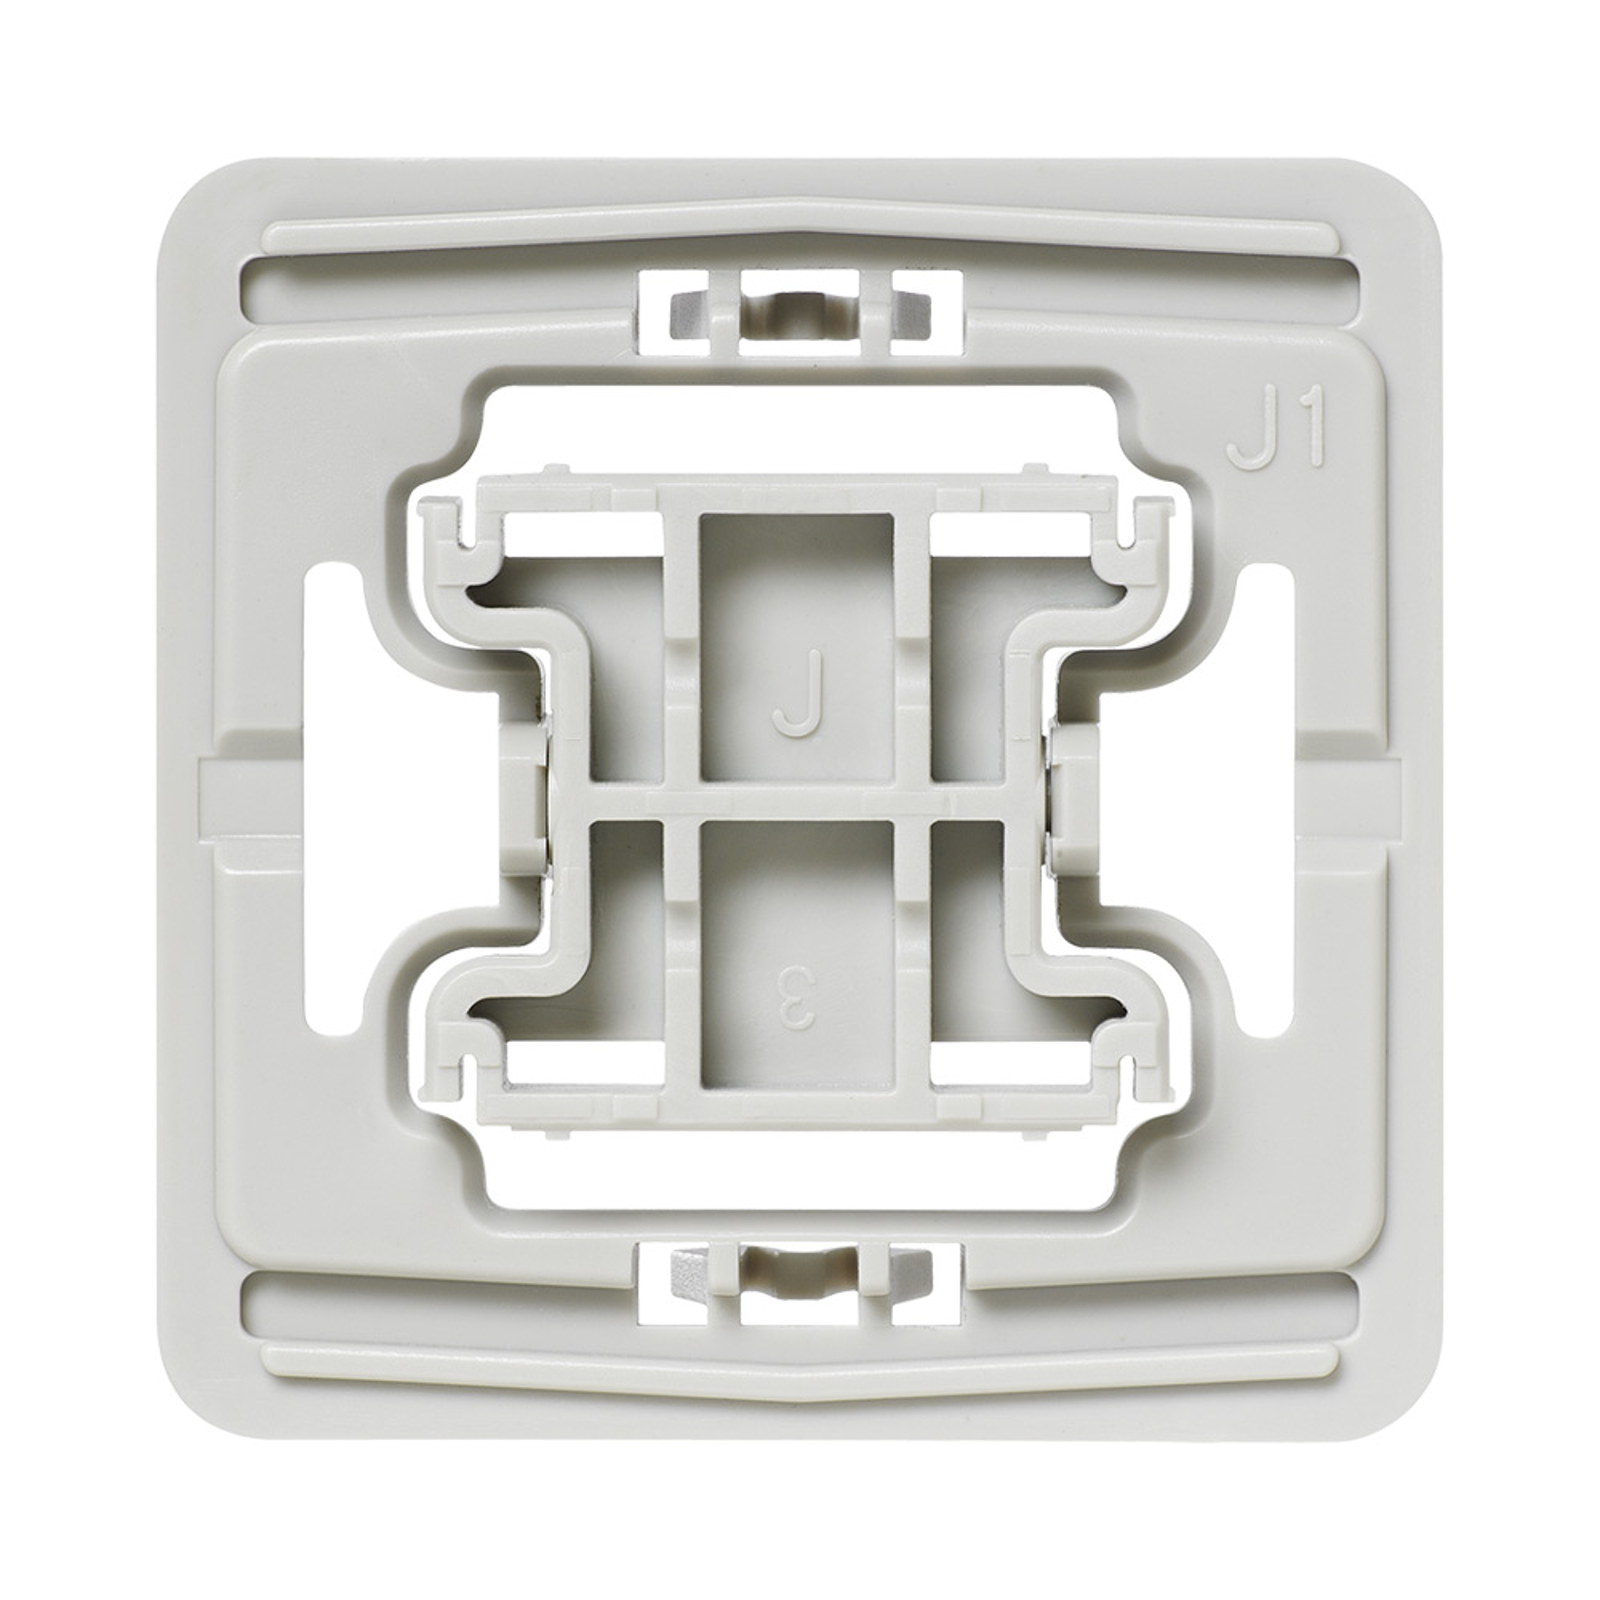 Homematic IP adaptateur interrupteurs Jung J1 20x